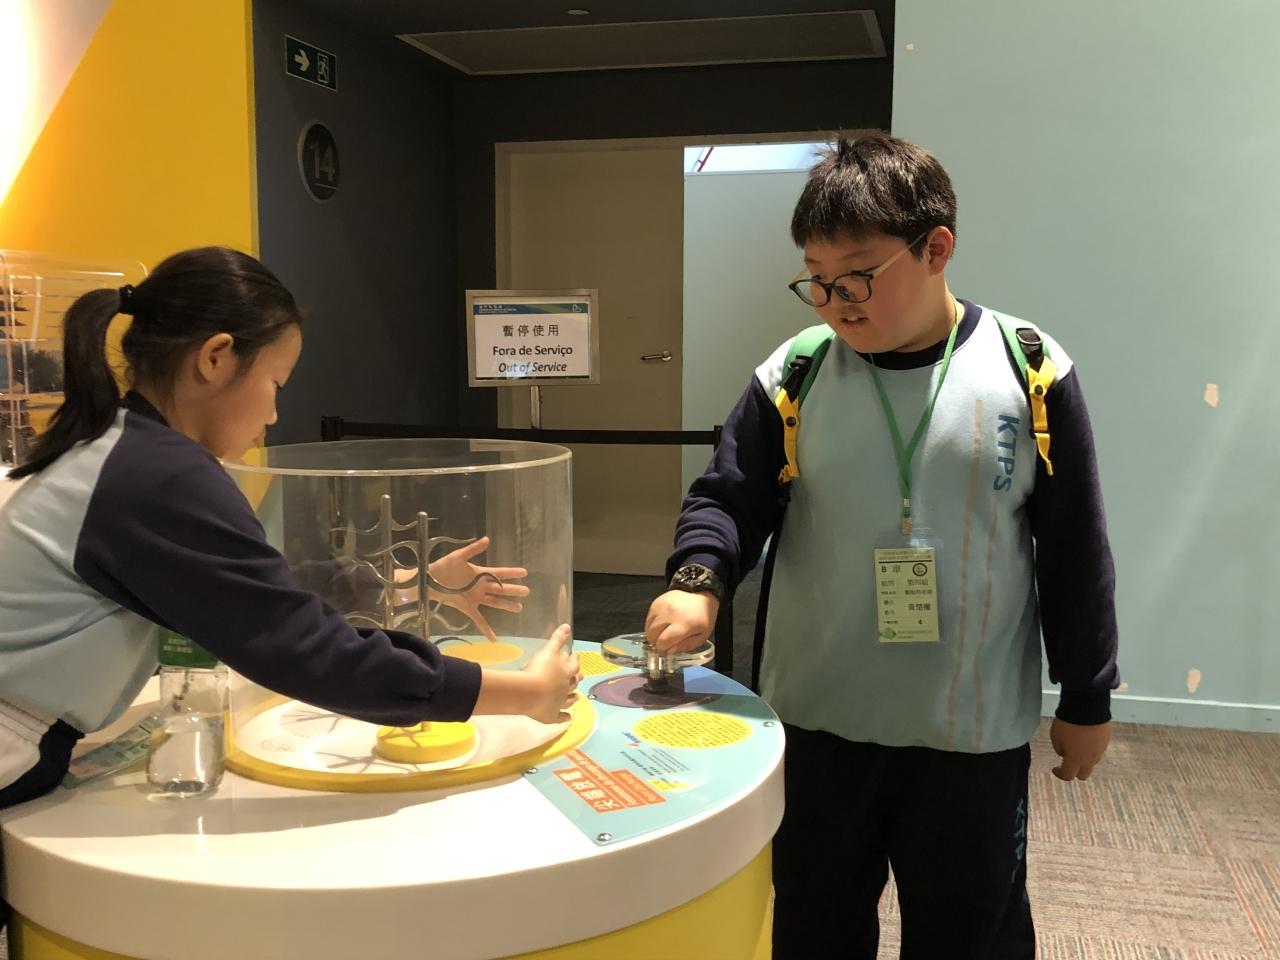 http://keito.school.hk/sites/default/files/batch_img_0939.jpg